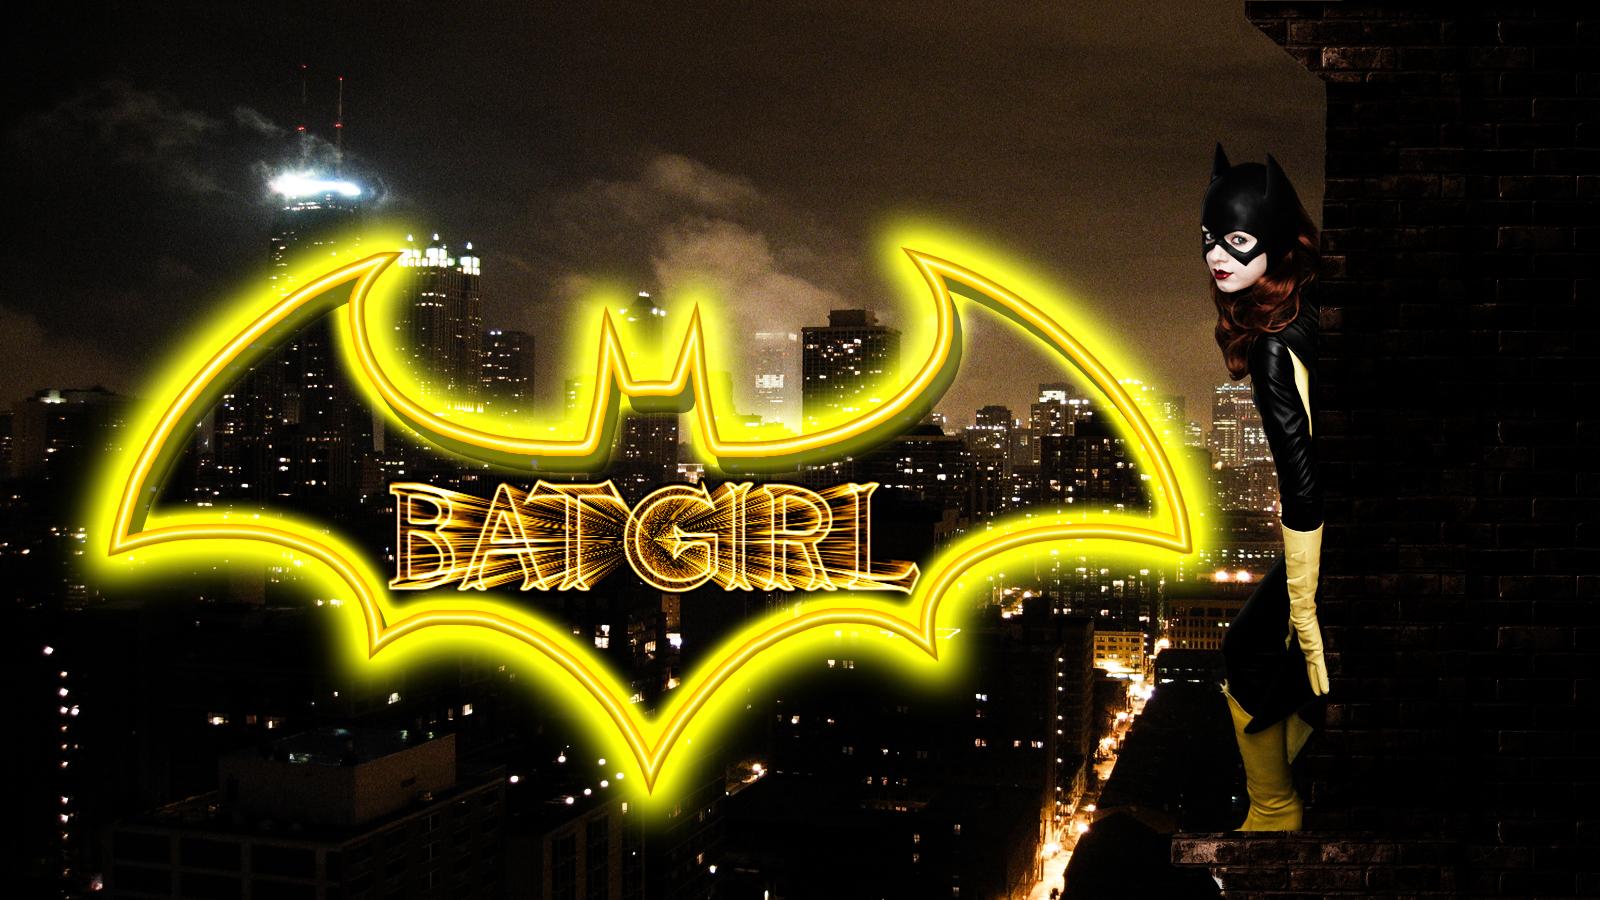 batgirl new 52 wallpaper - photo #28